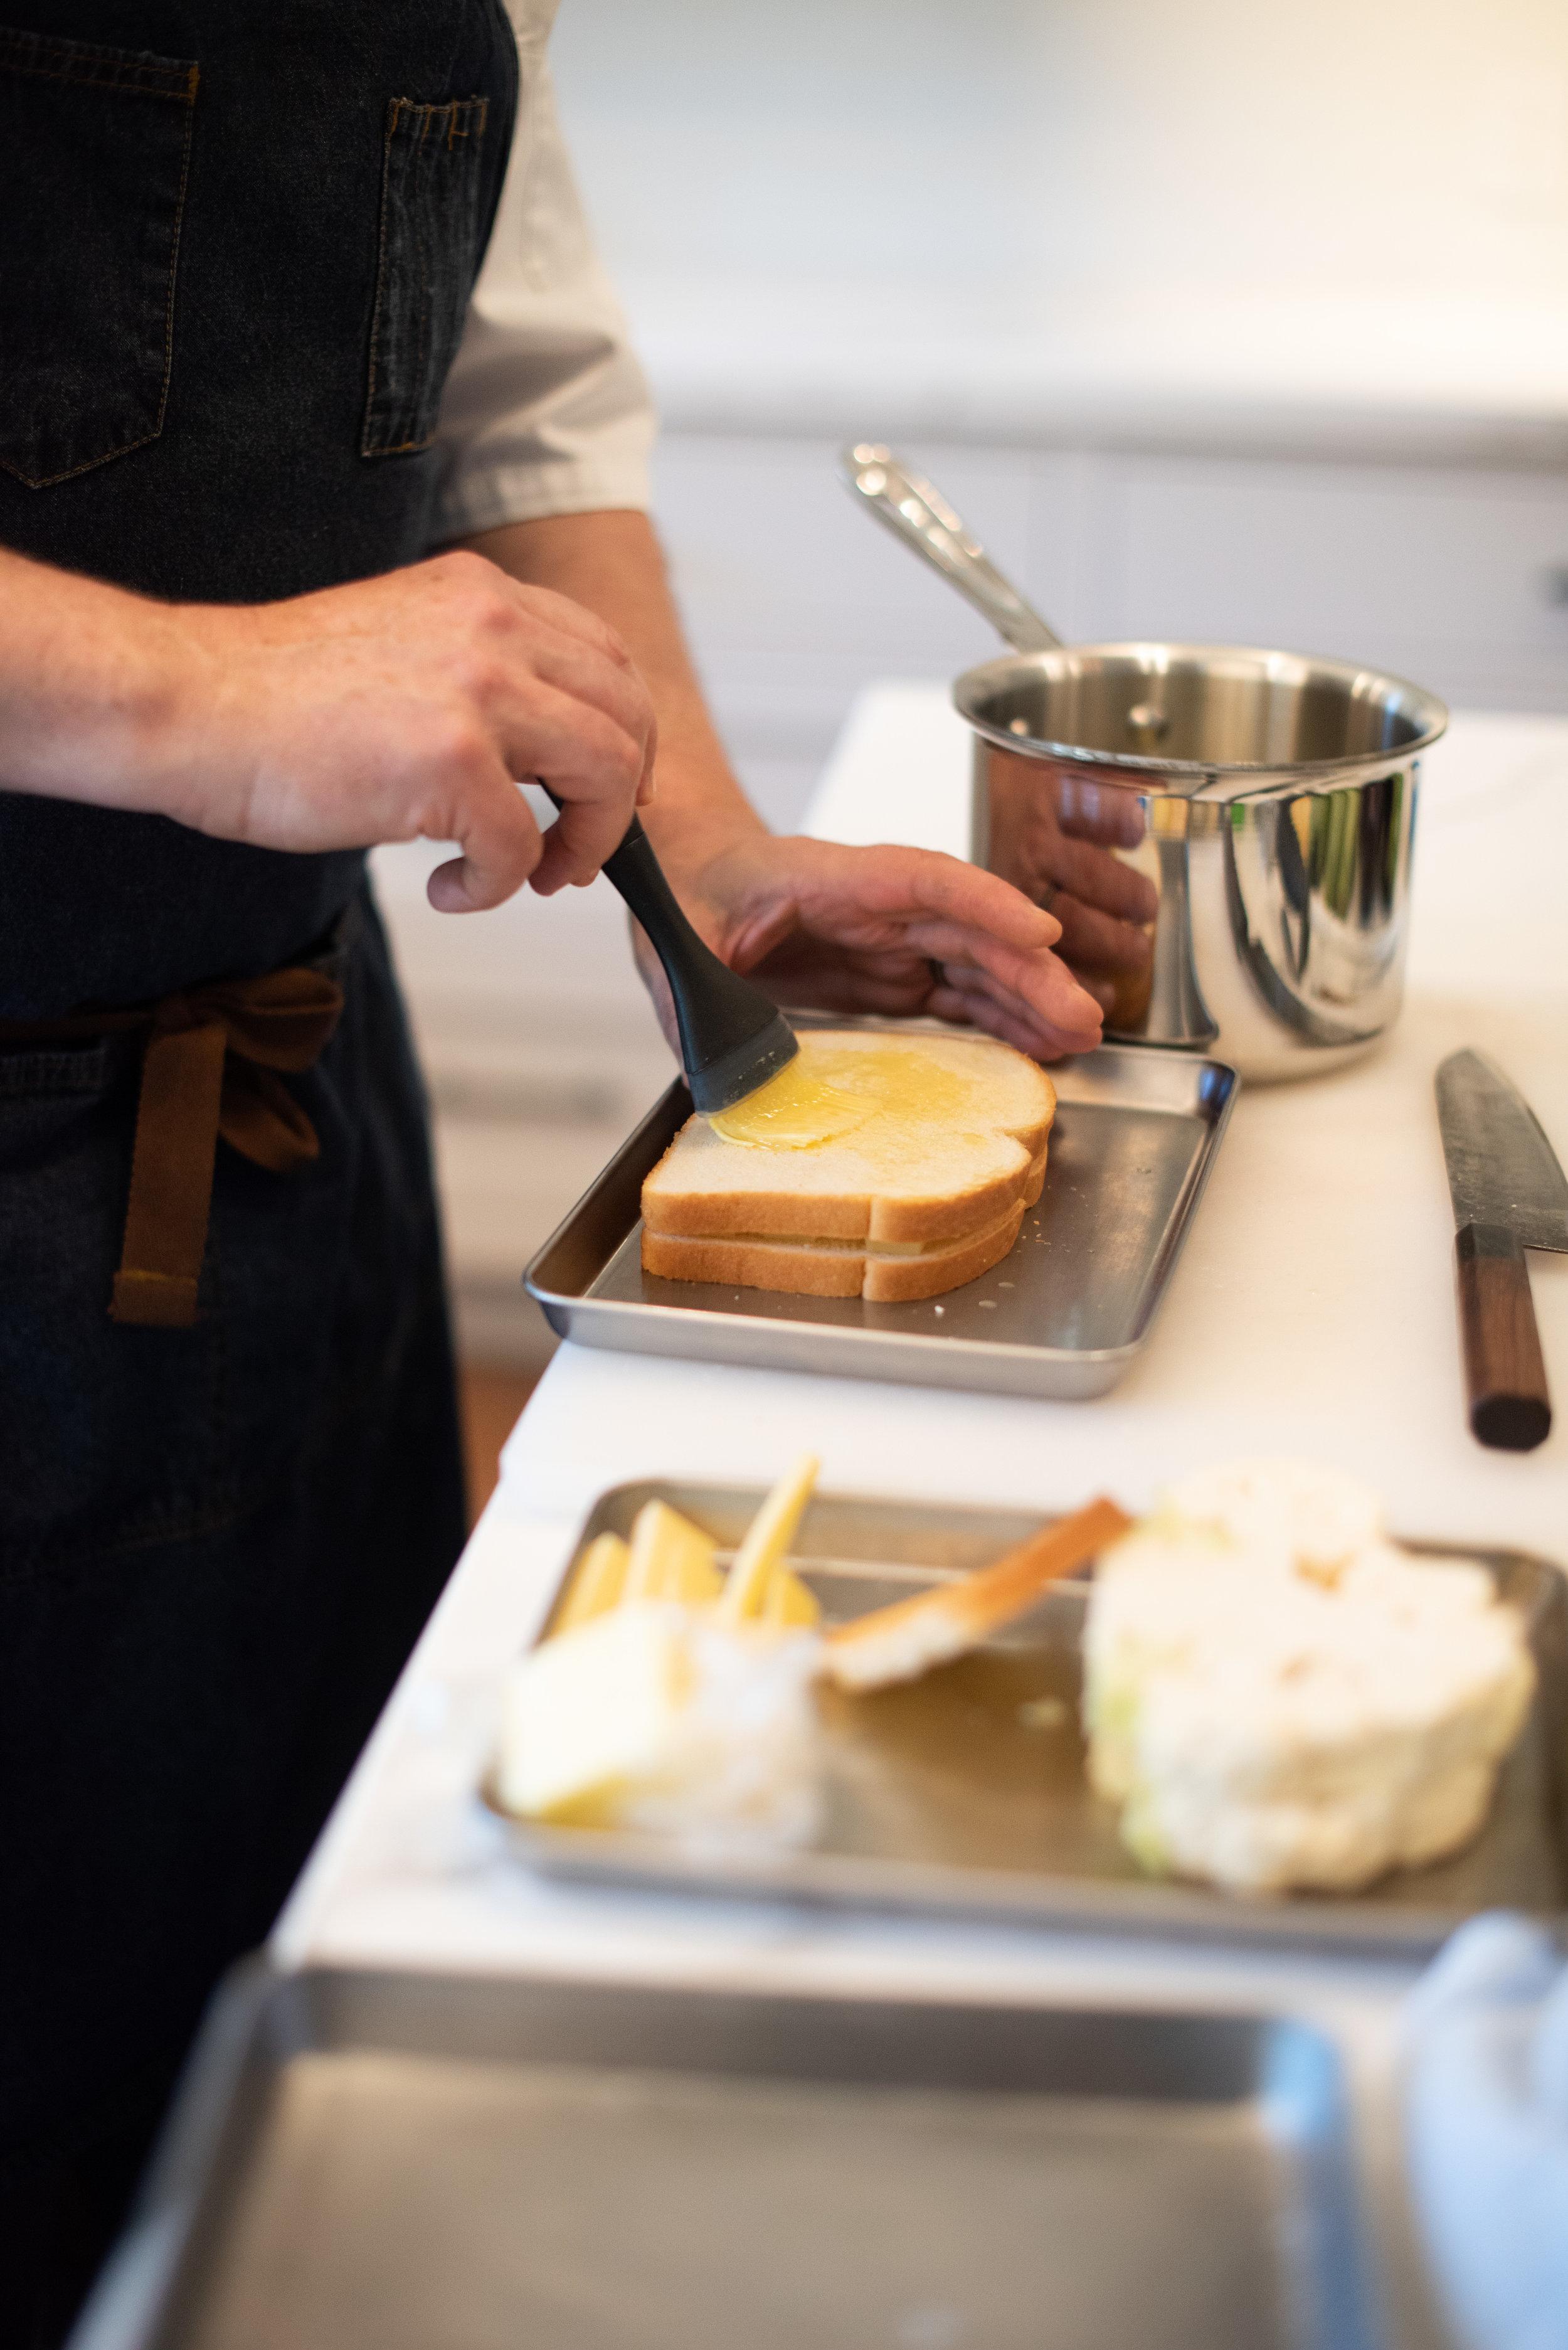 Brushing bread